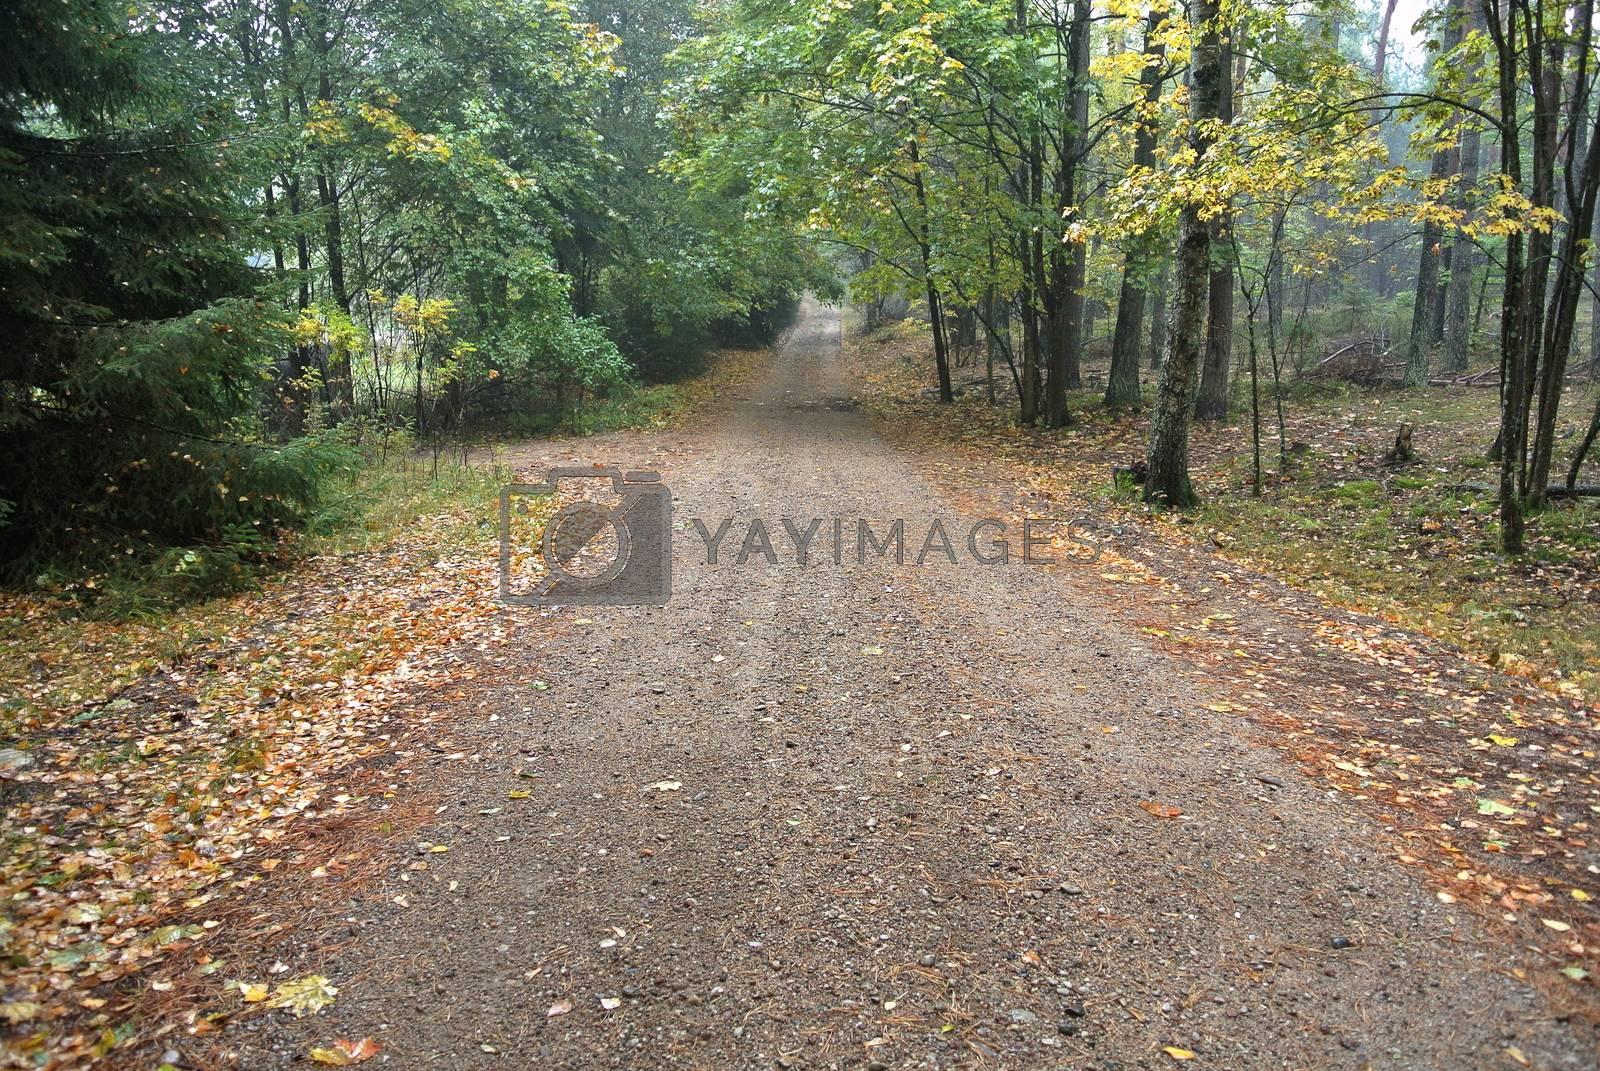 Royalty free image of Autumn forest road by info@krzysztofpiotrowicz.com